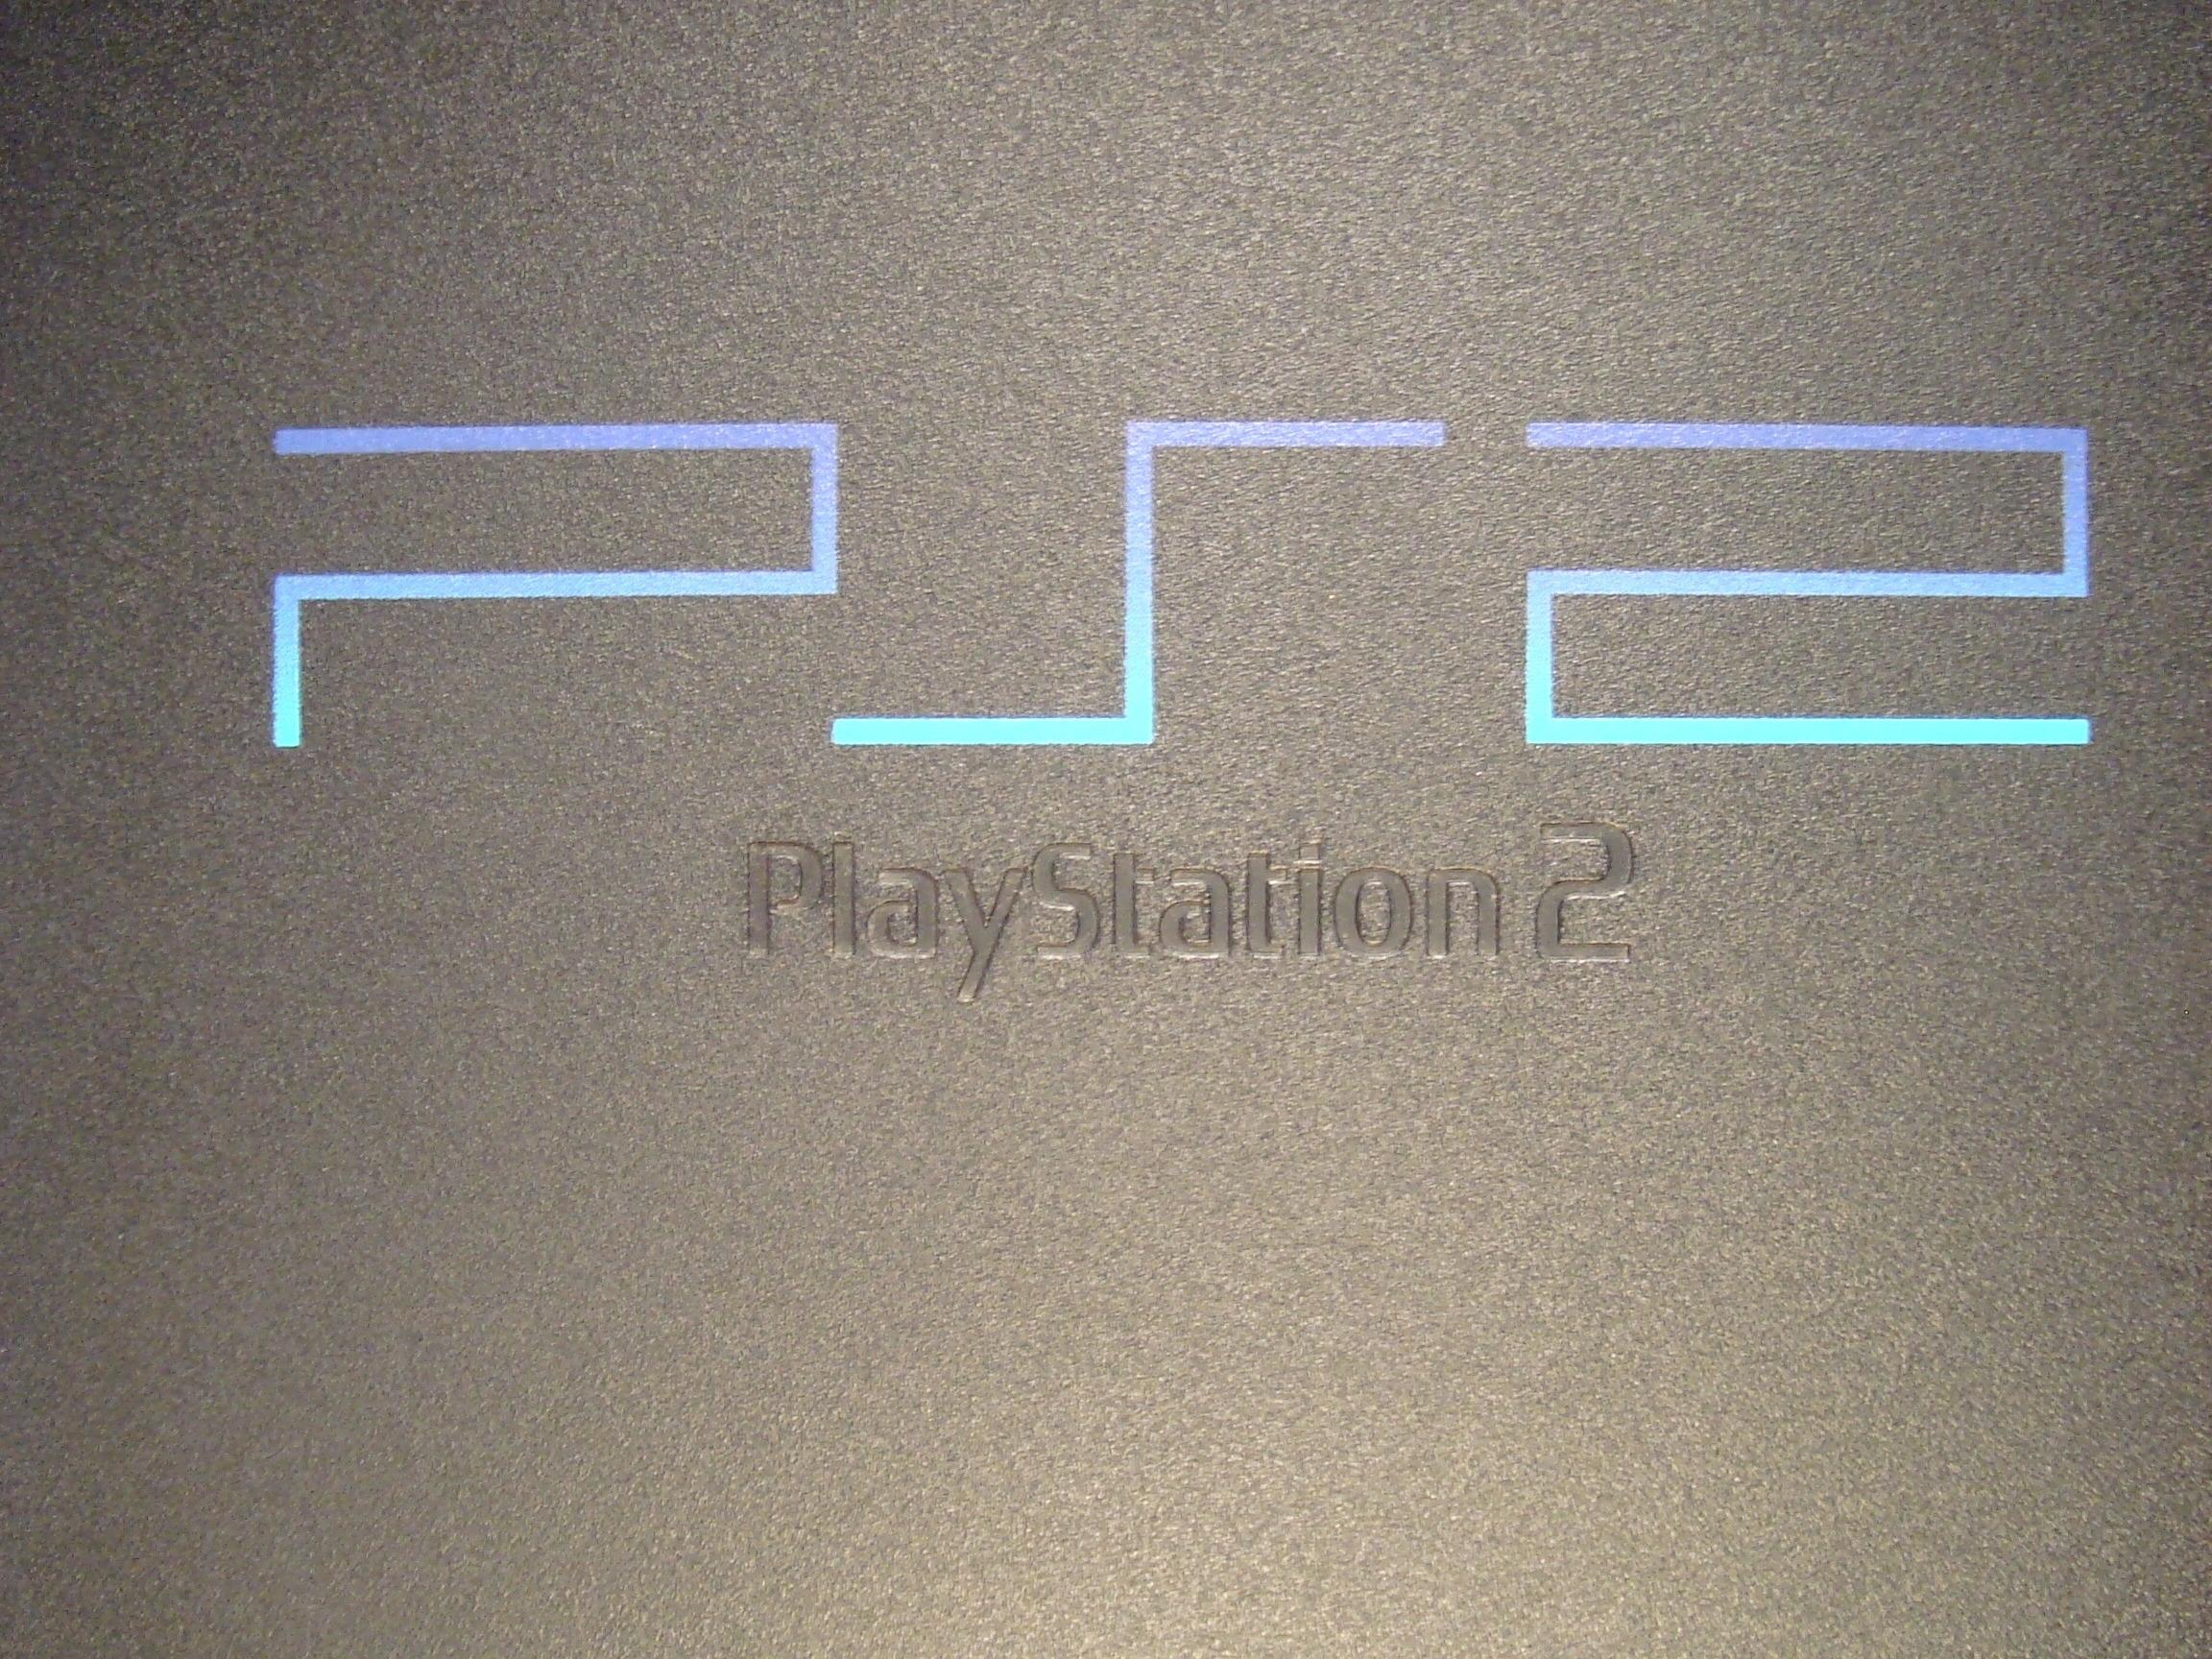 sony playstation 2 logo. sony playstation 2 logo